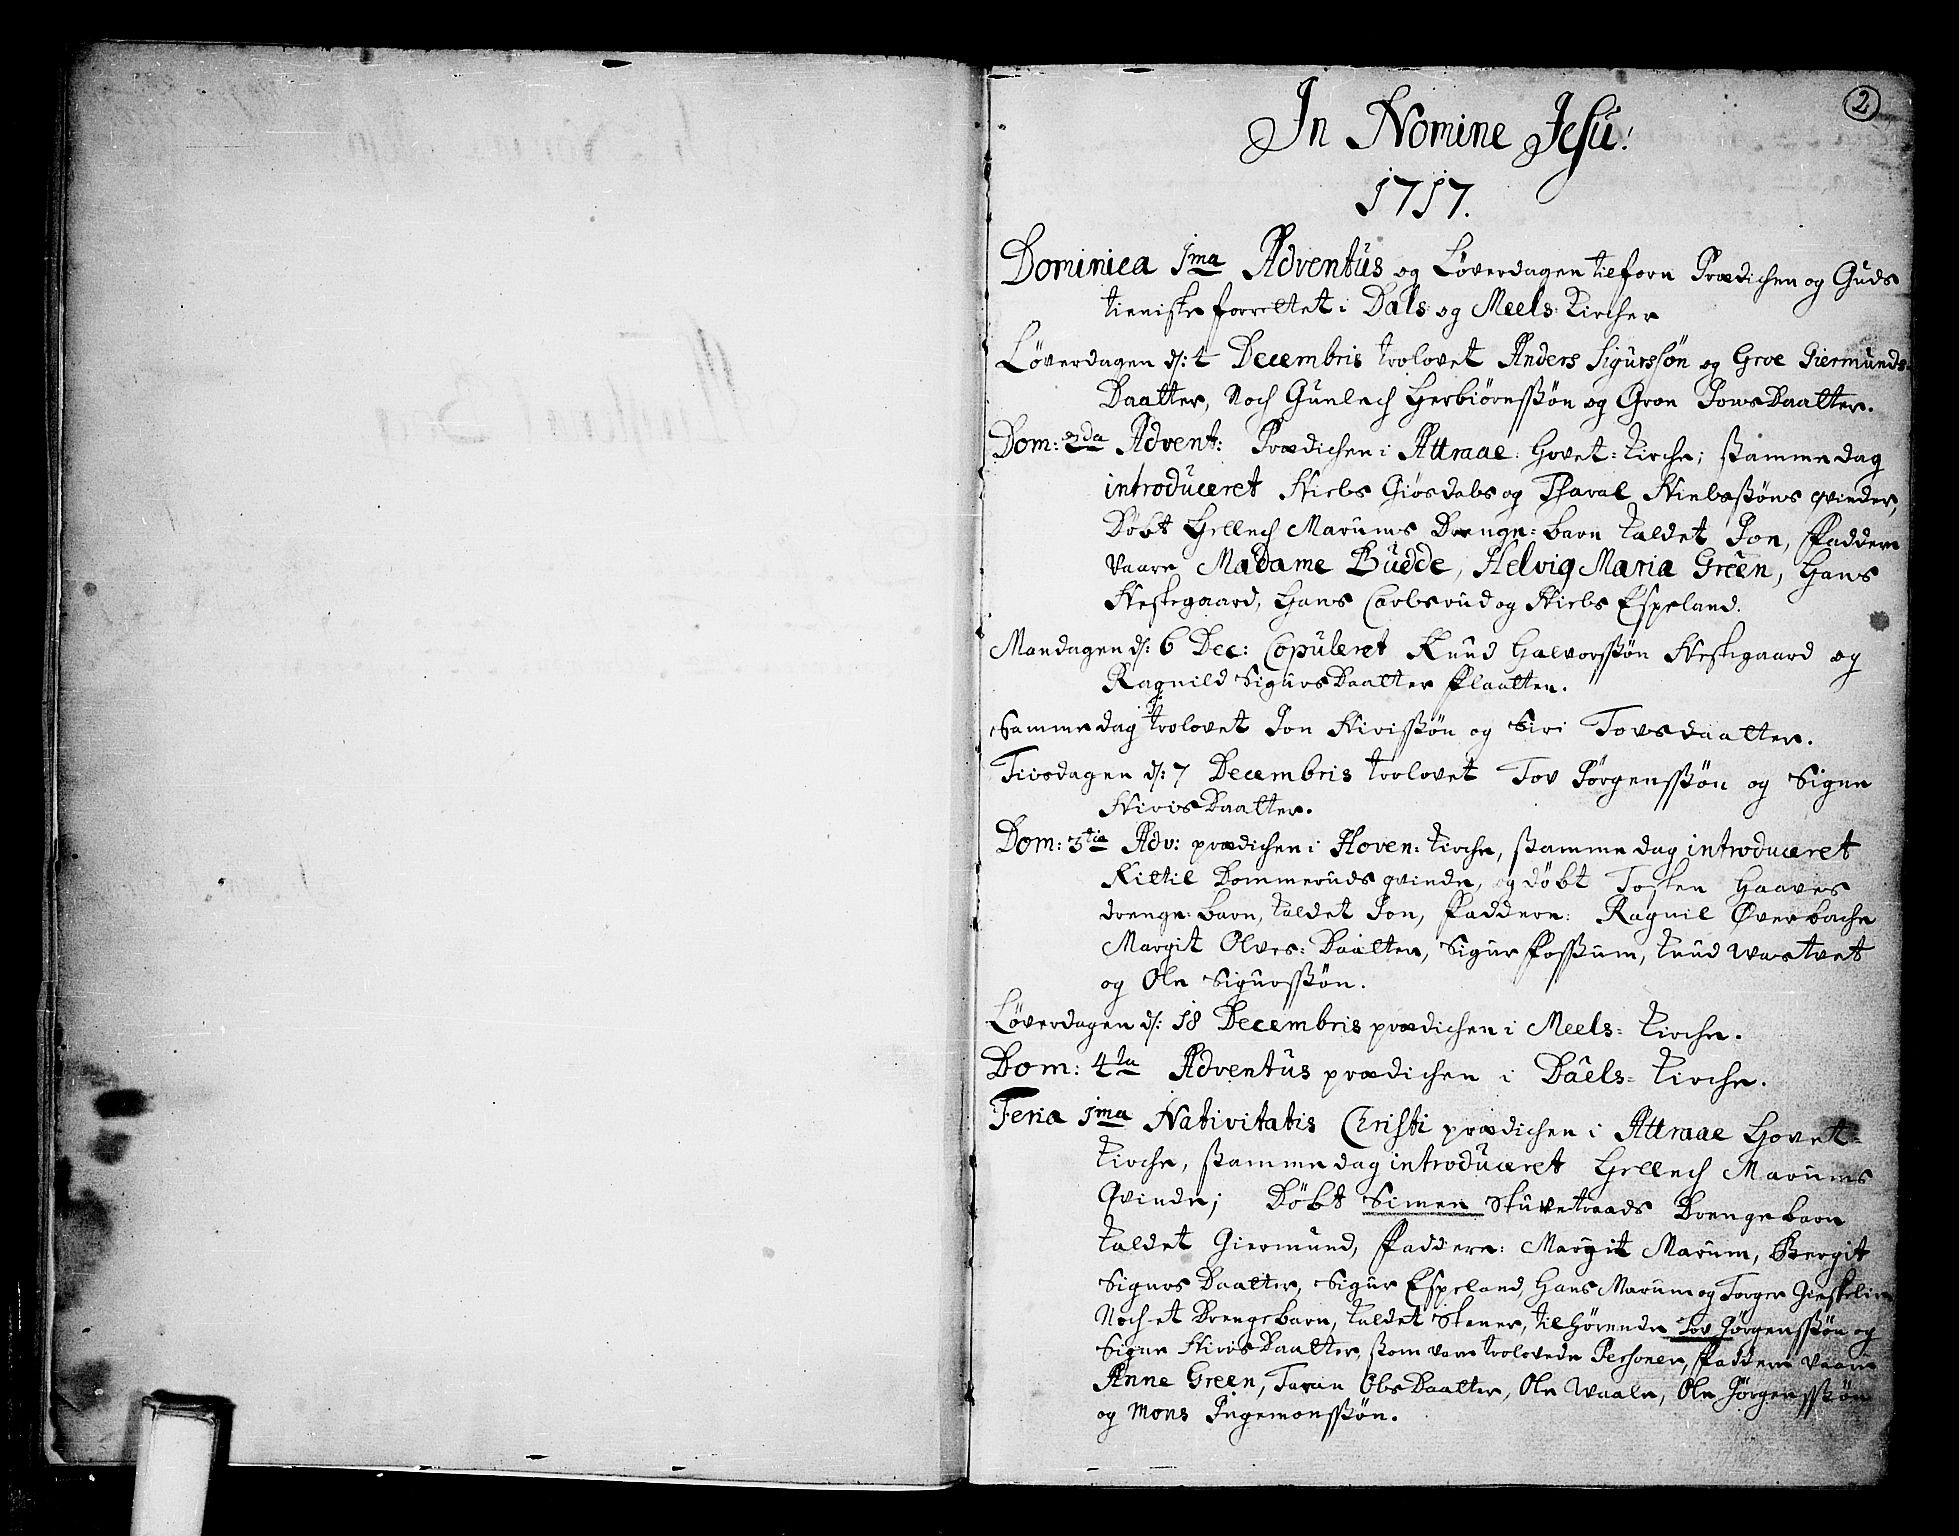 SAKO, Tinn kirkebøker, F/Fa/L0001: Ministerialbok nr. I 1, 1717-1734, s. 2